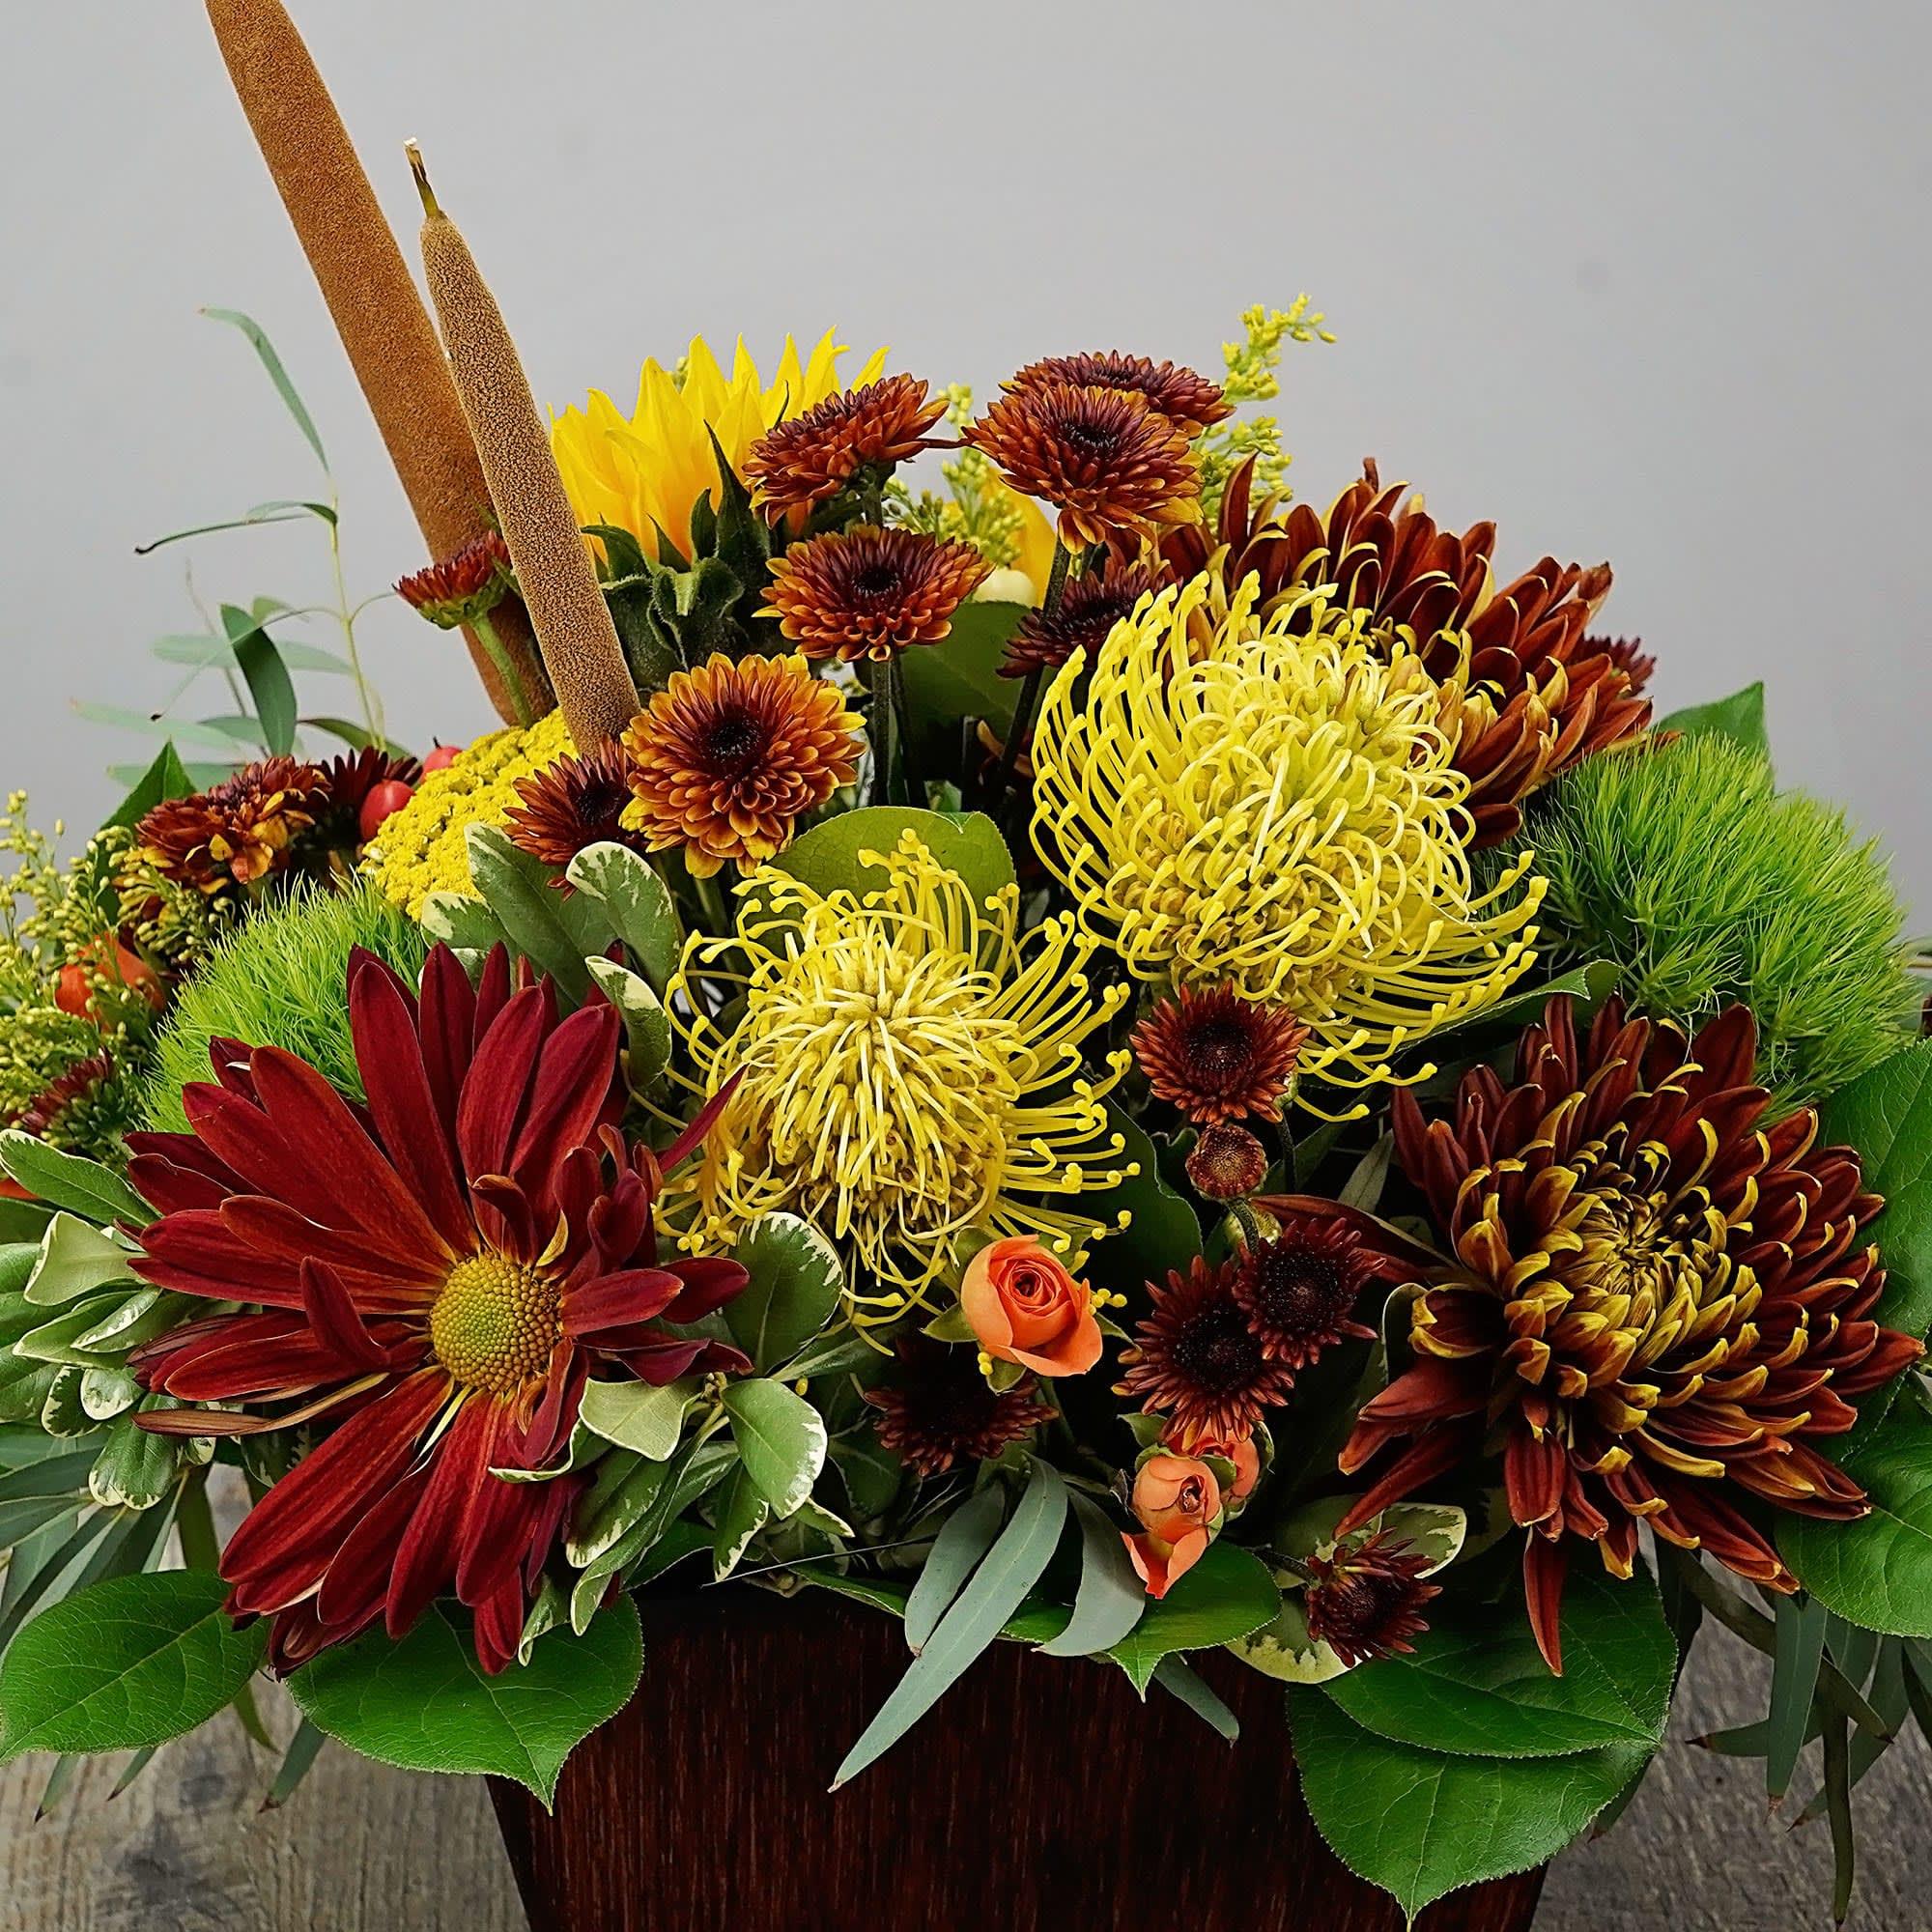 Rathbone S Autumn Rush By Rathbone S Flair Flowers